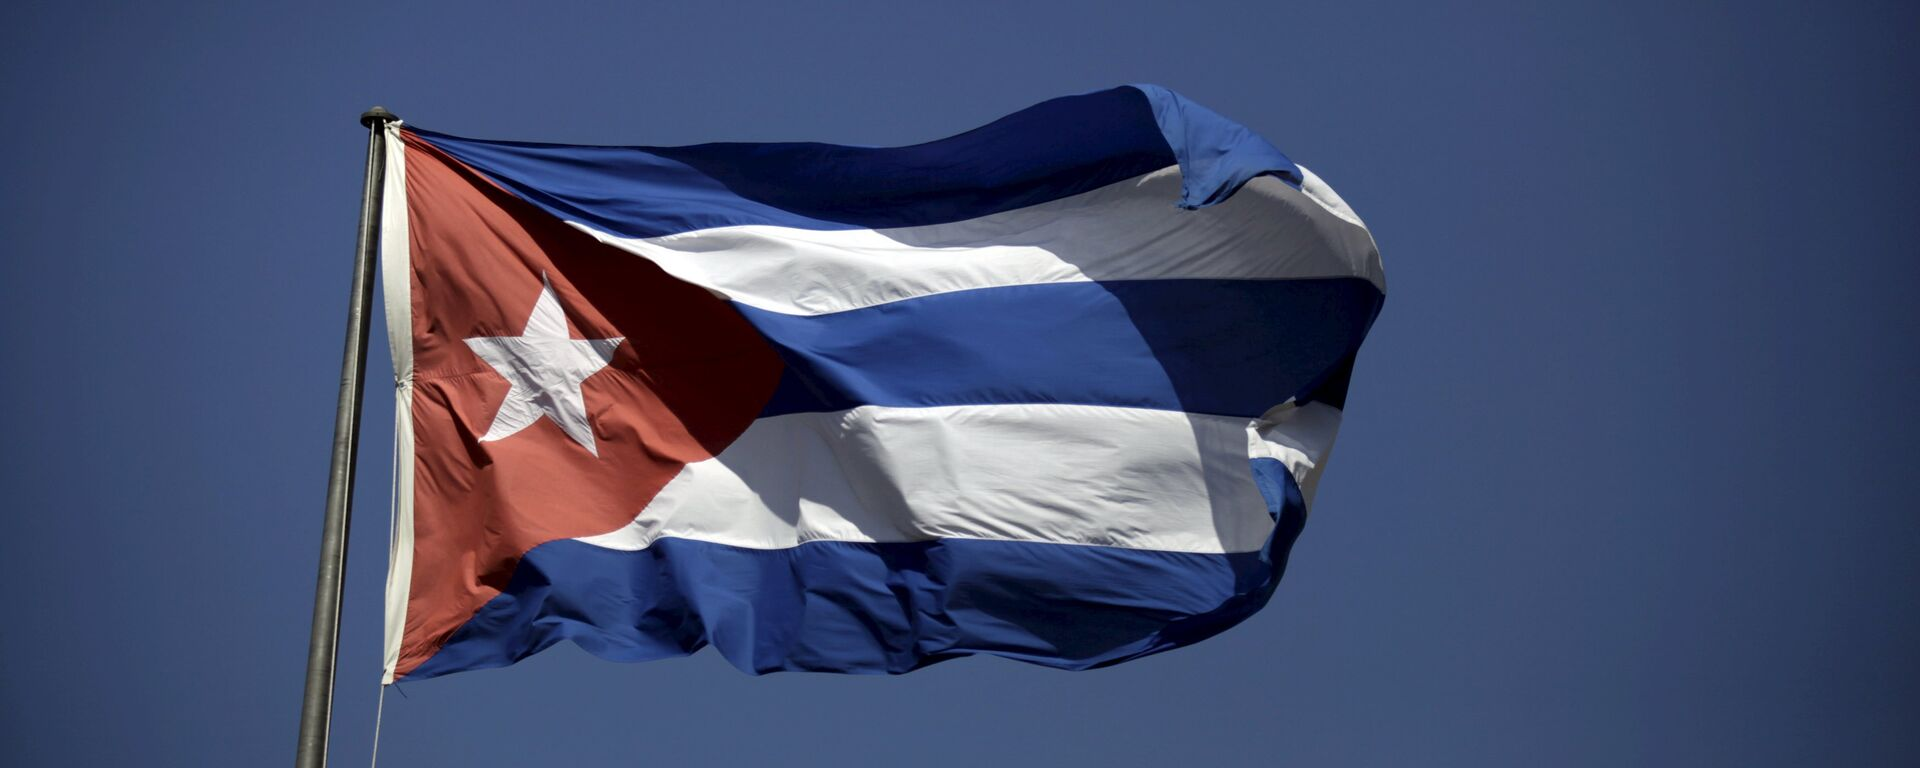 Bandera de Cuba - Sputnik Mundo, 1920, 10.06.2021